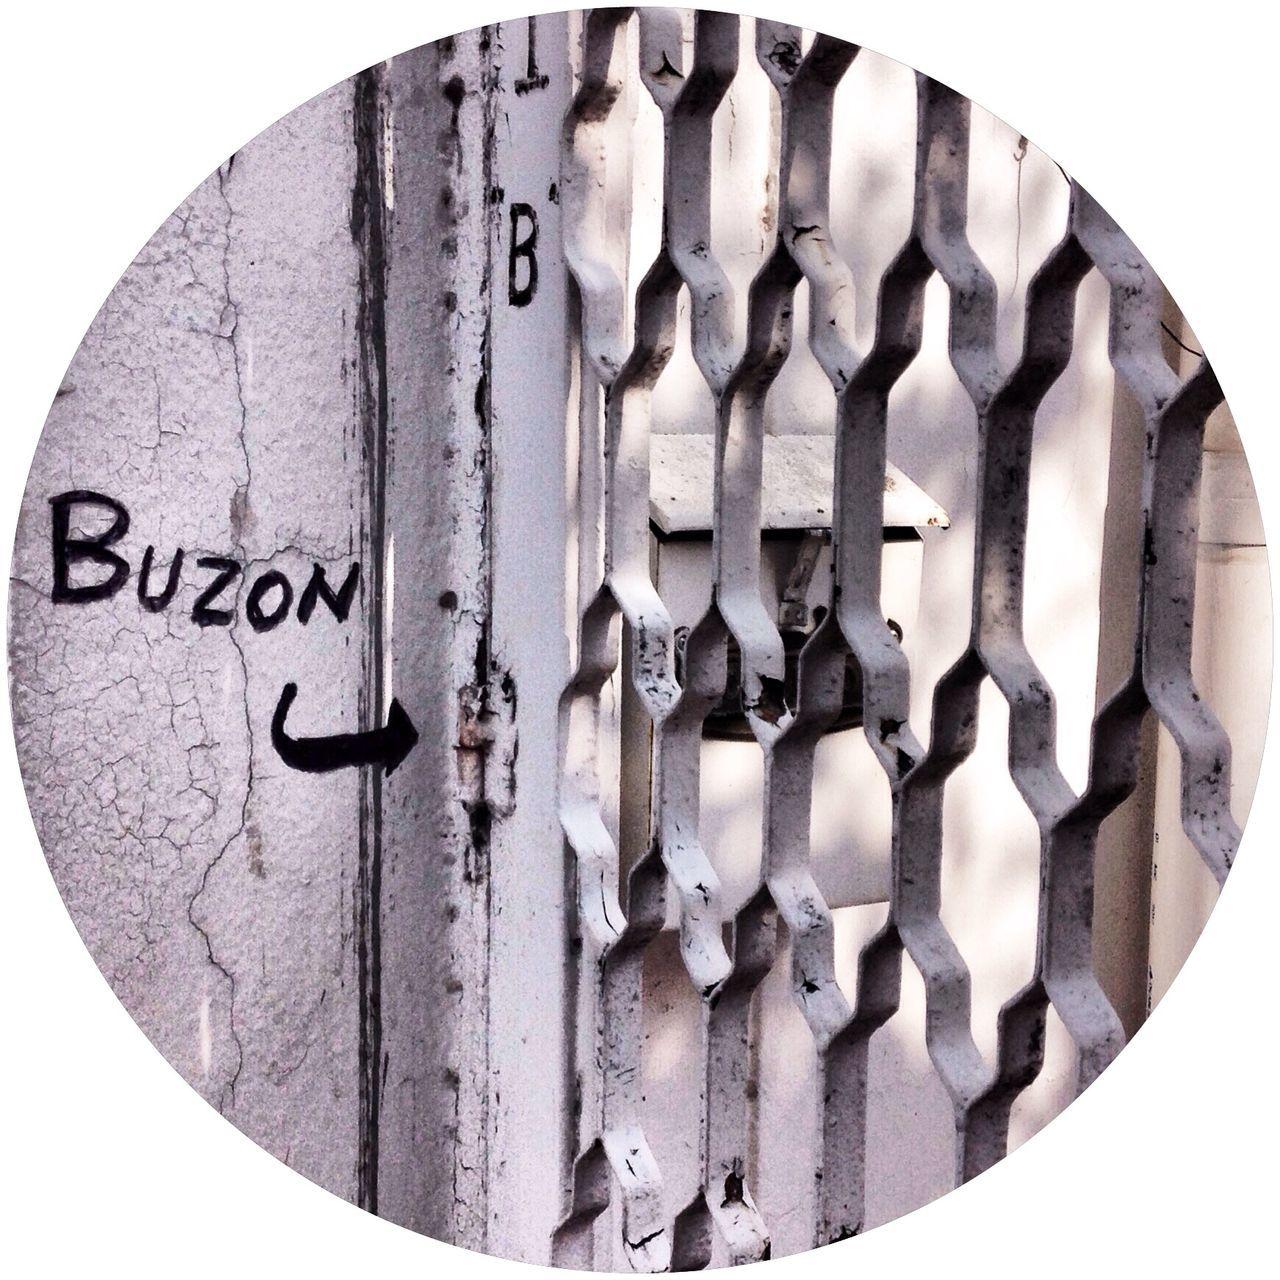 Buzón... Streetphotography IPhoneography Urban@ndante